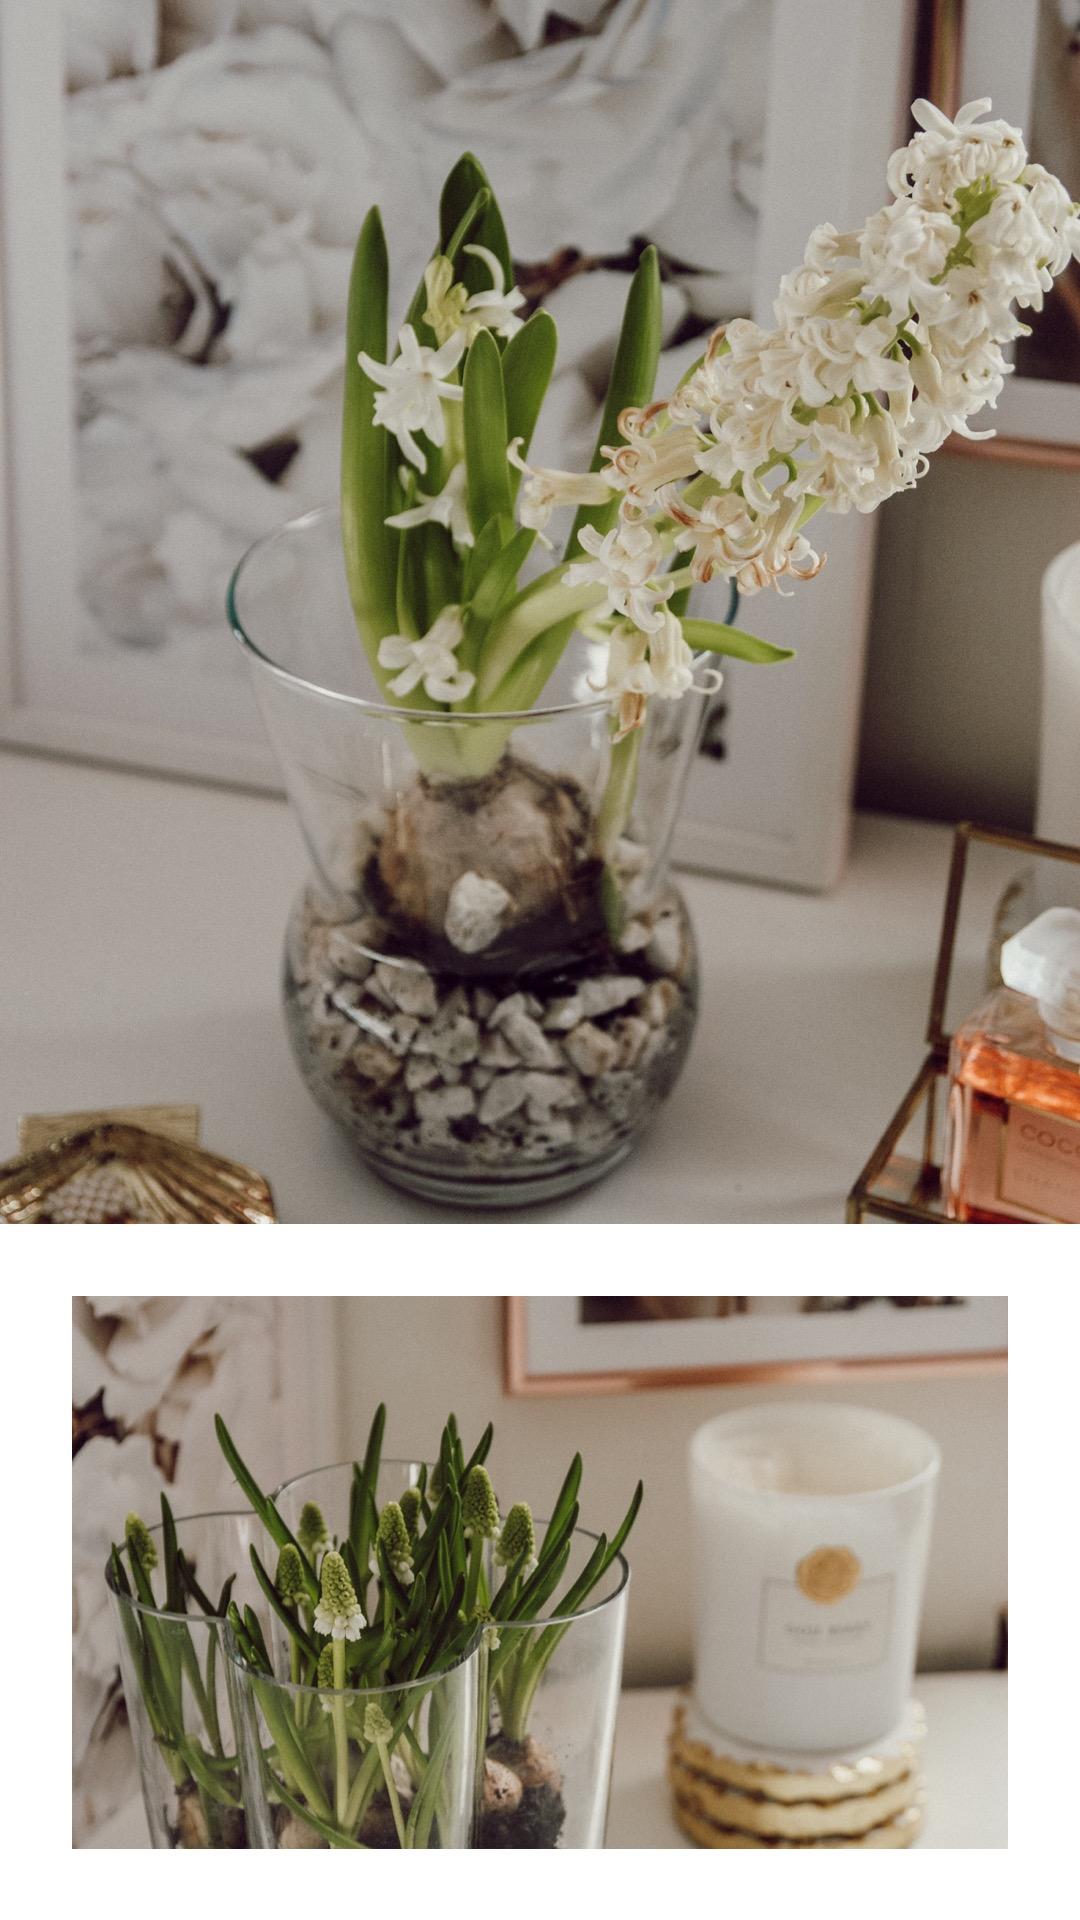 Frühlingsdeko im Glas, Hyazinthen im Glas Deko Frühling